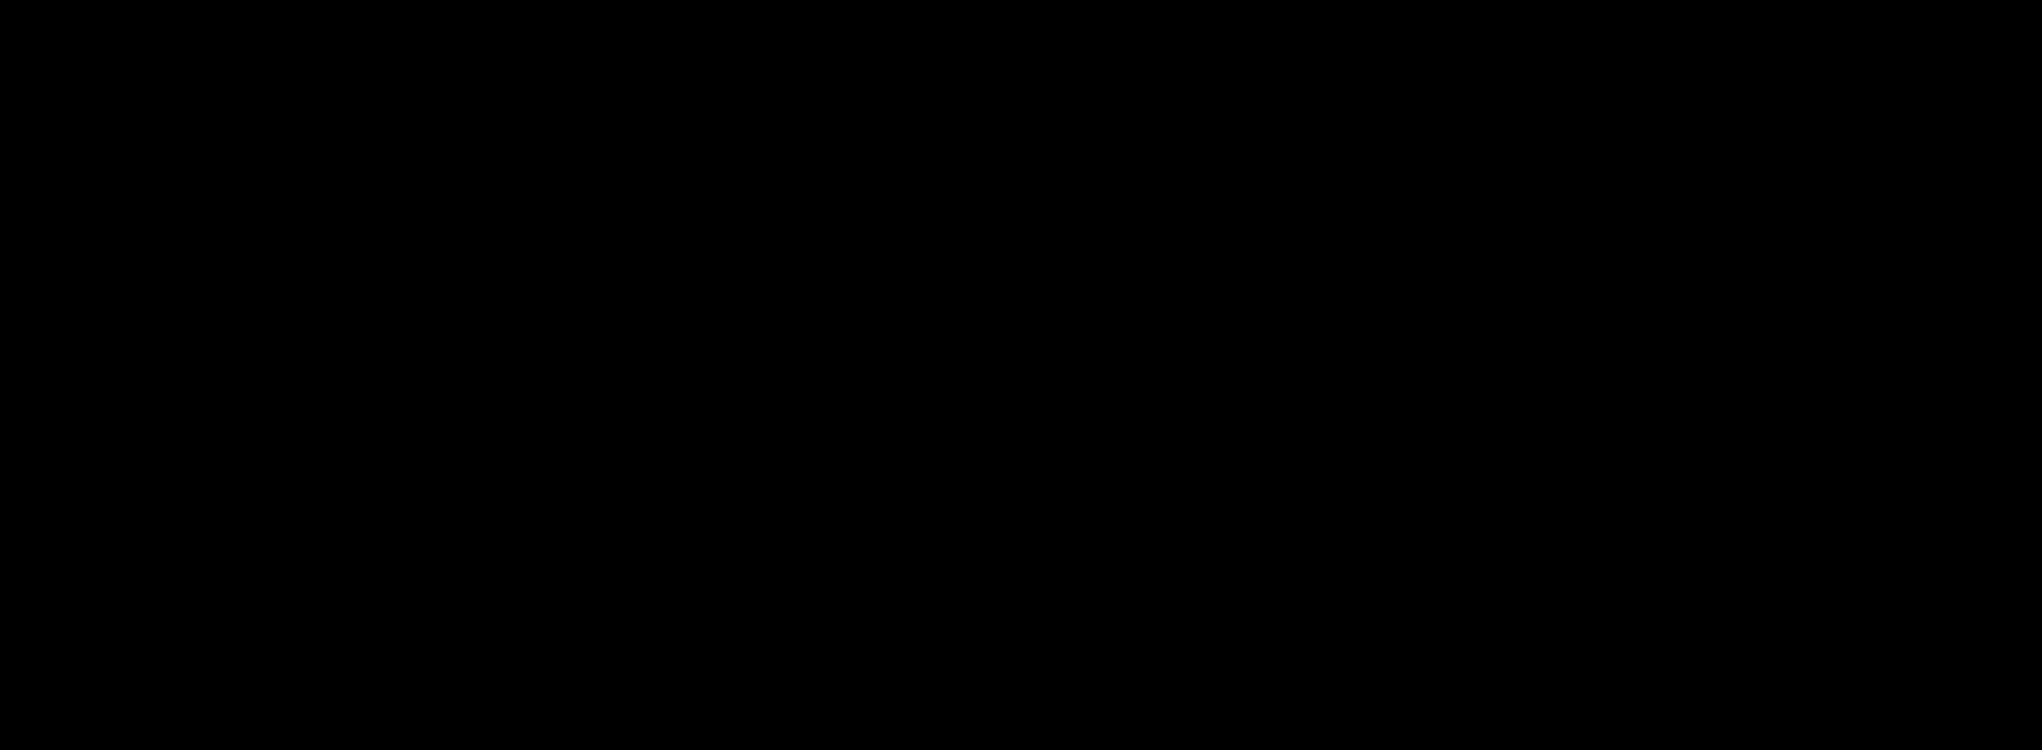 3-(Benzo-18-crown-6-)18-amidopropylphosphonic acid